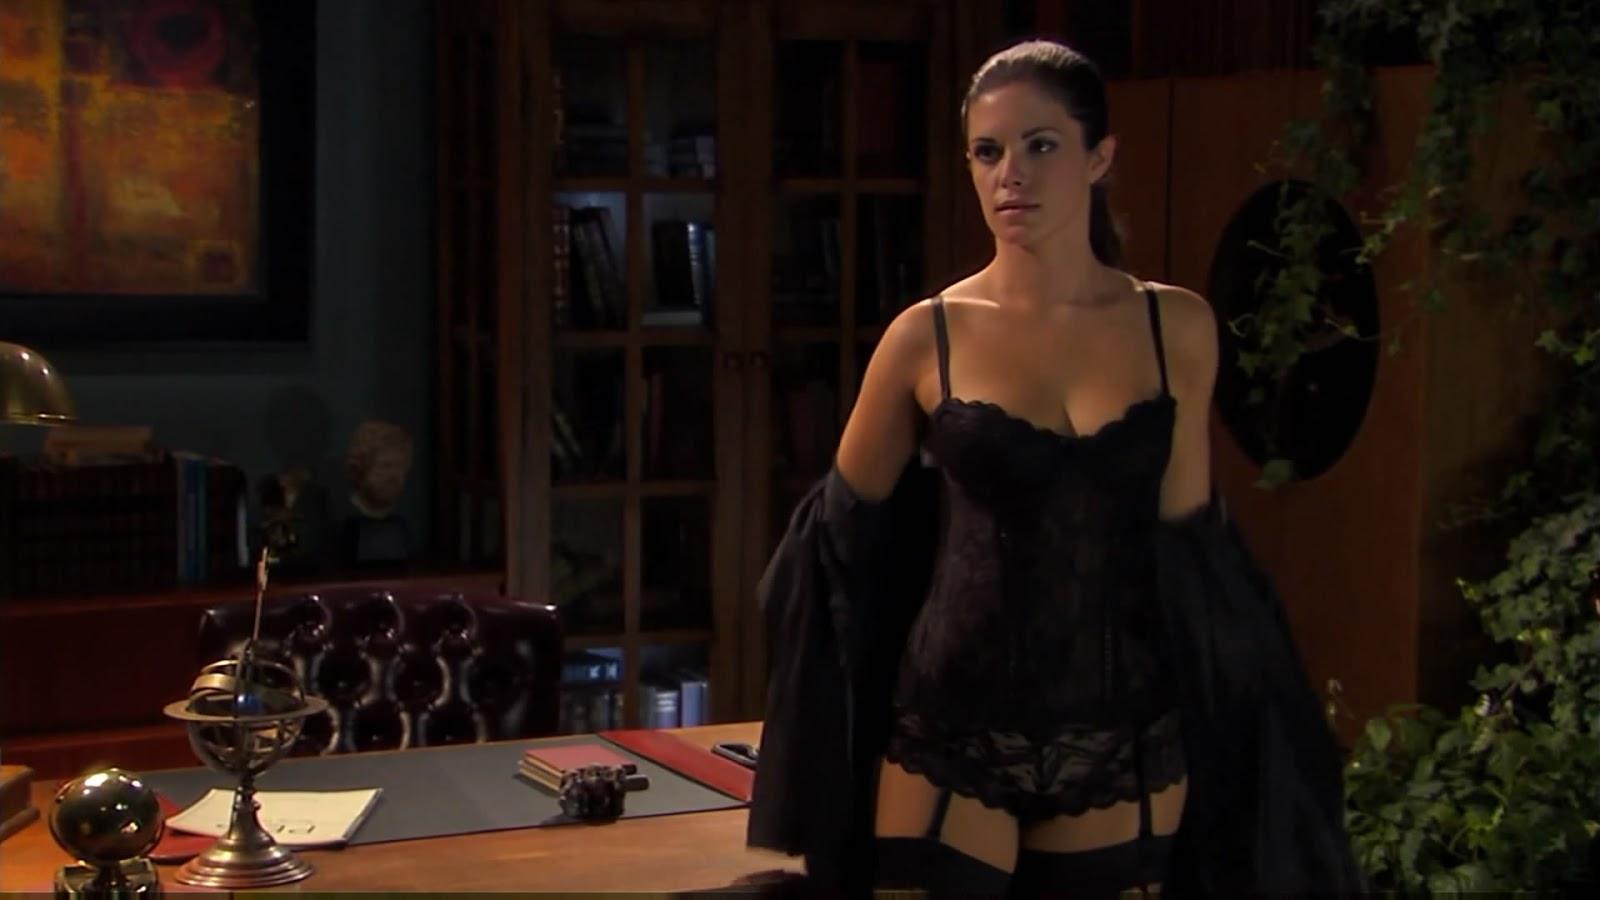 Shawna Waldron Sex Killing Scene In Poison Ivy Hd 1080P 02 -9392